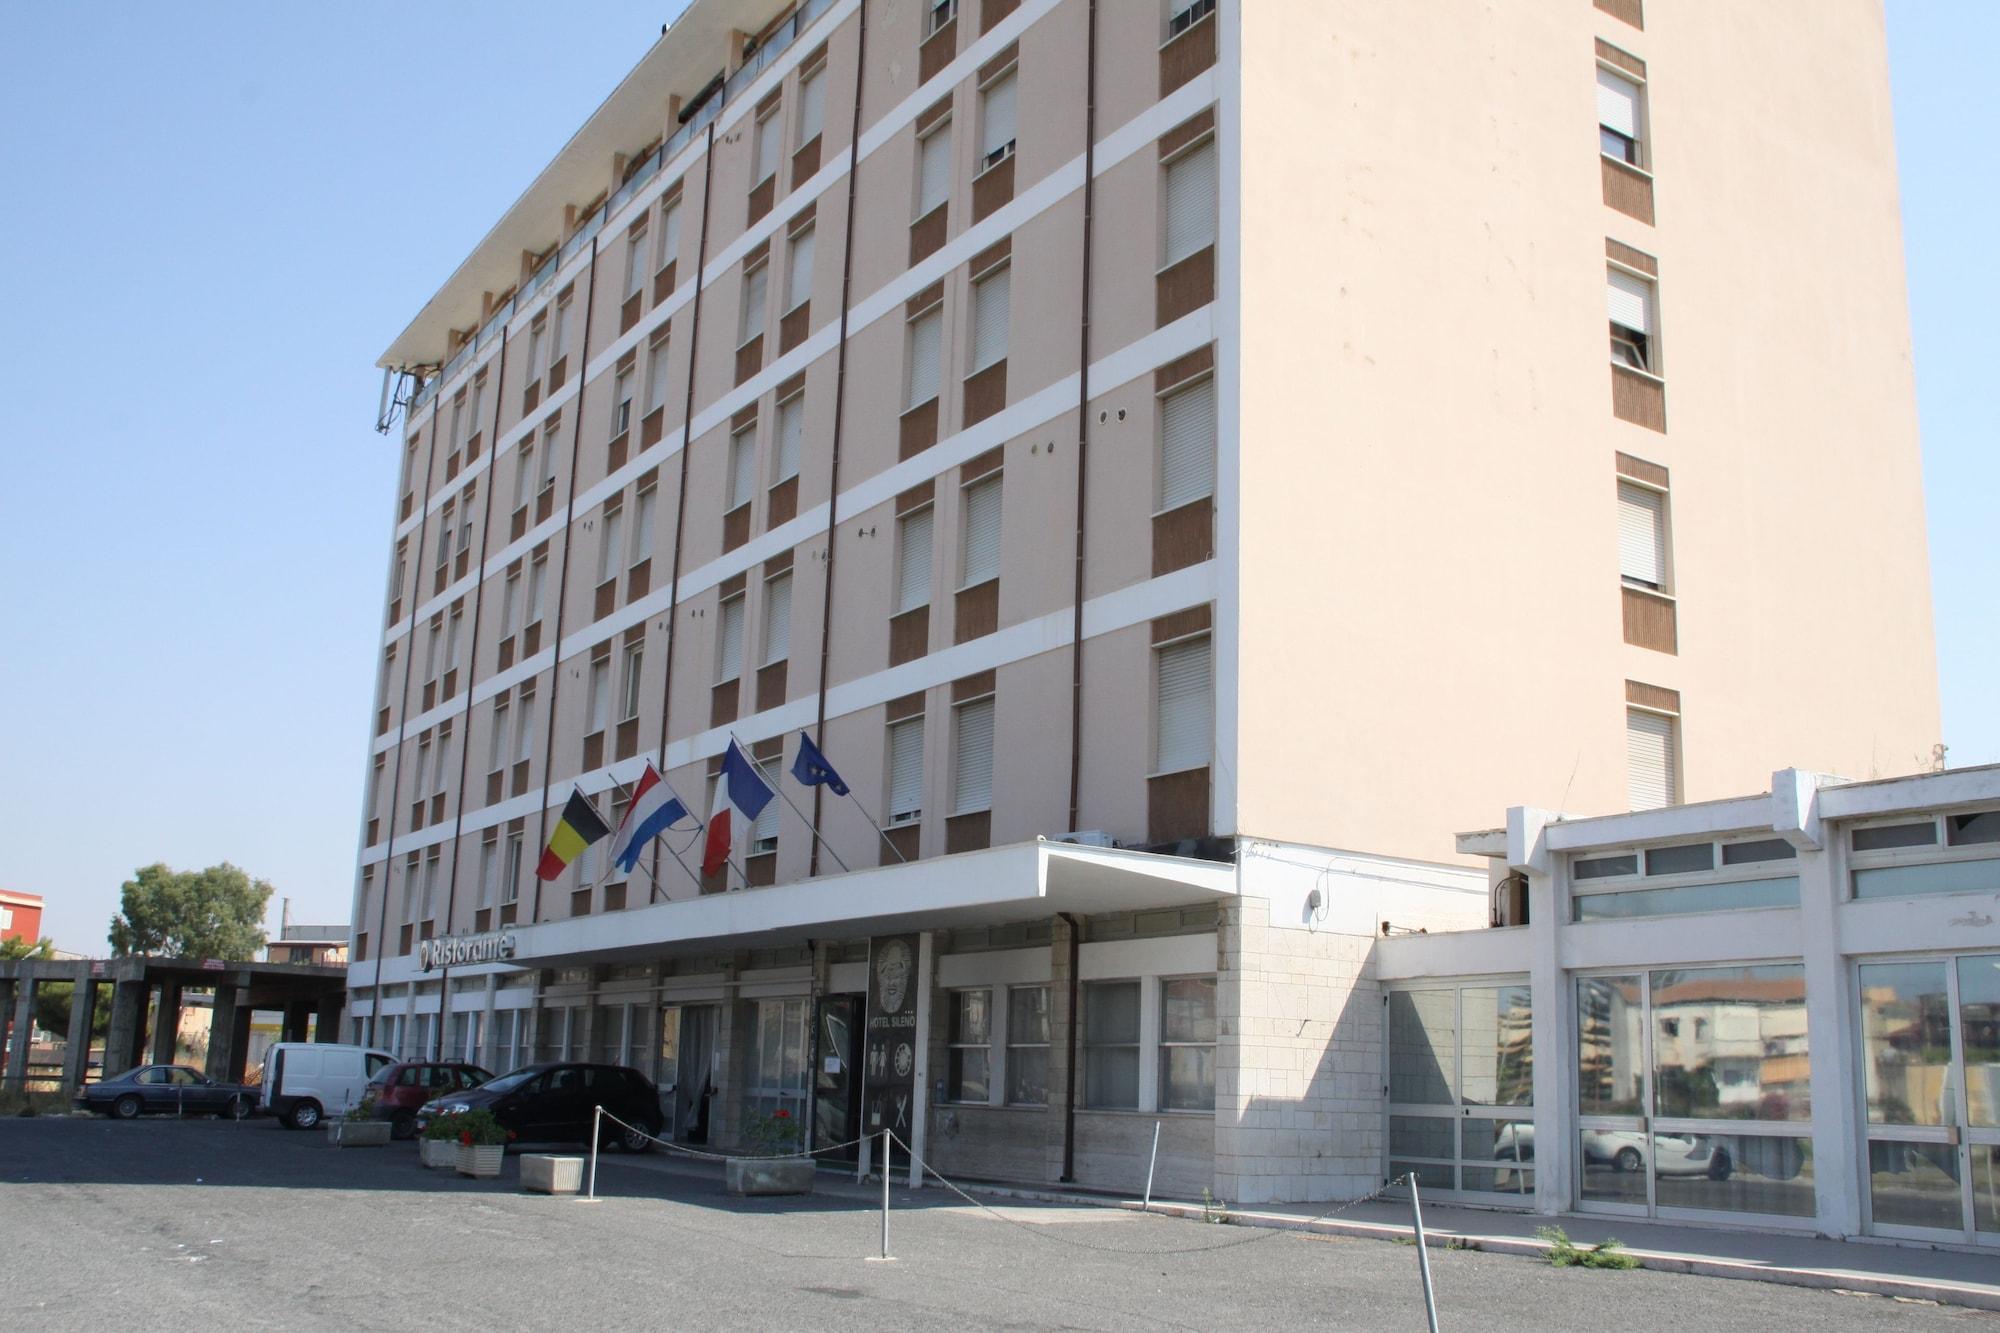 Hotel Sileno, Caltanissetta